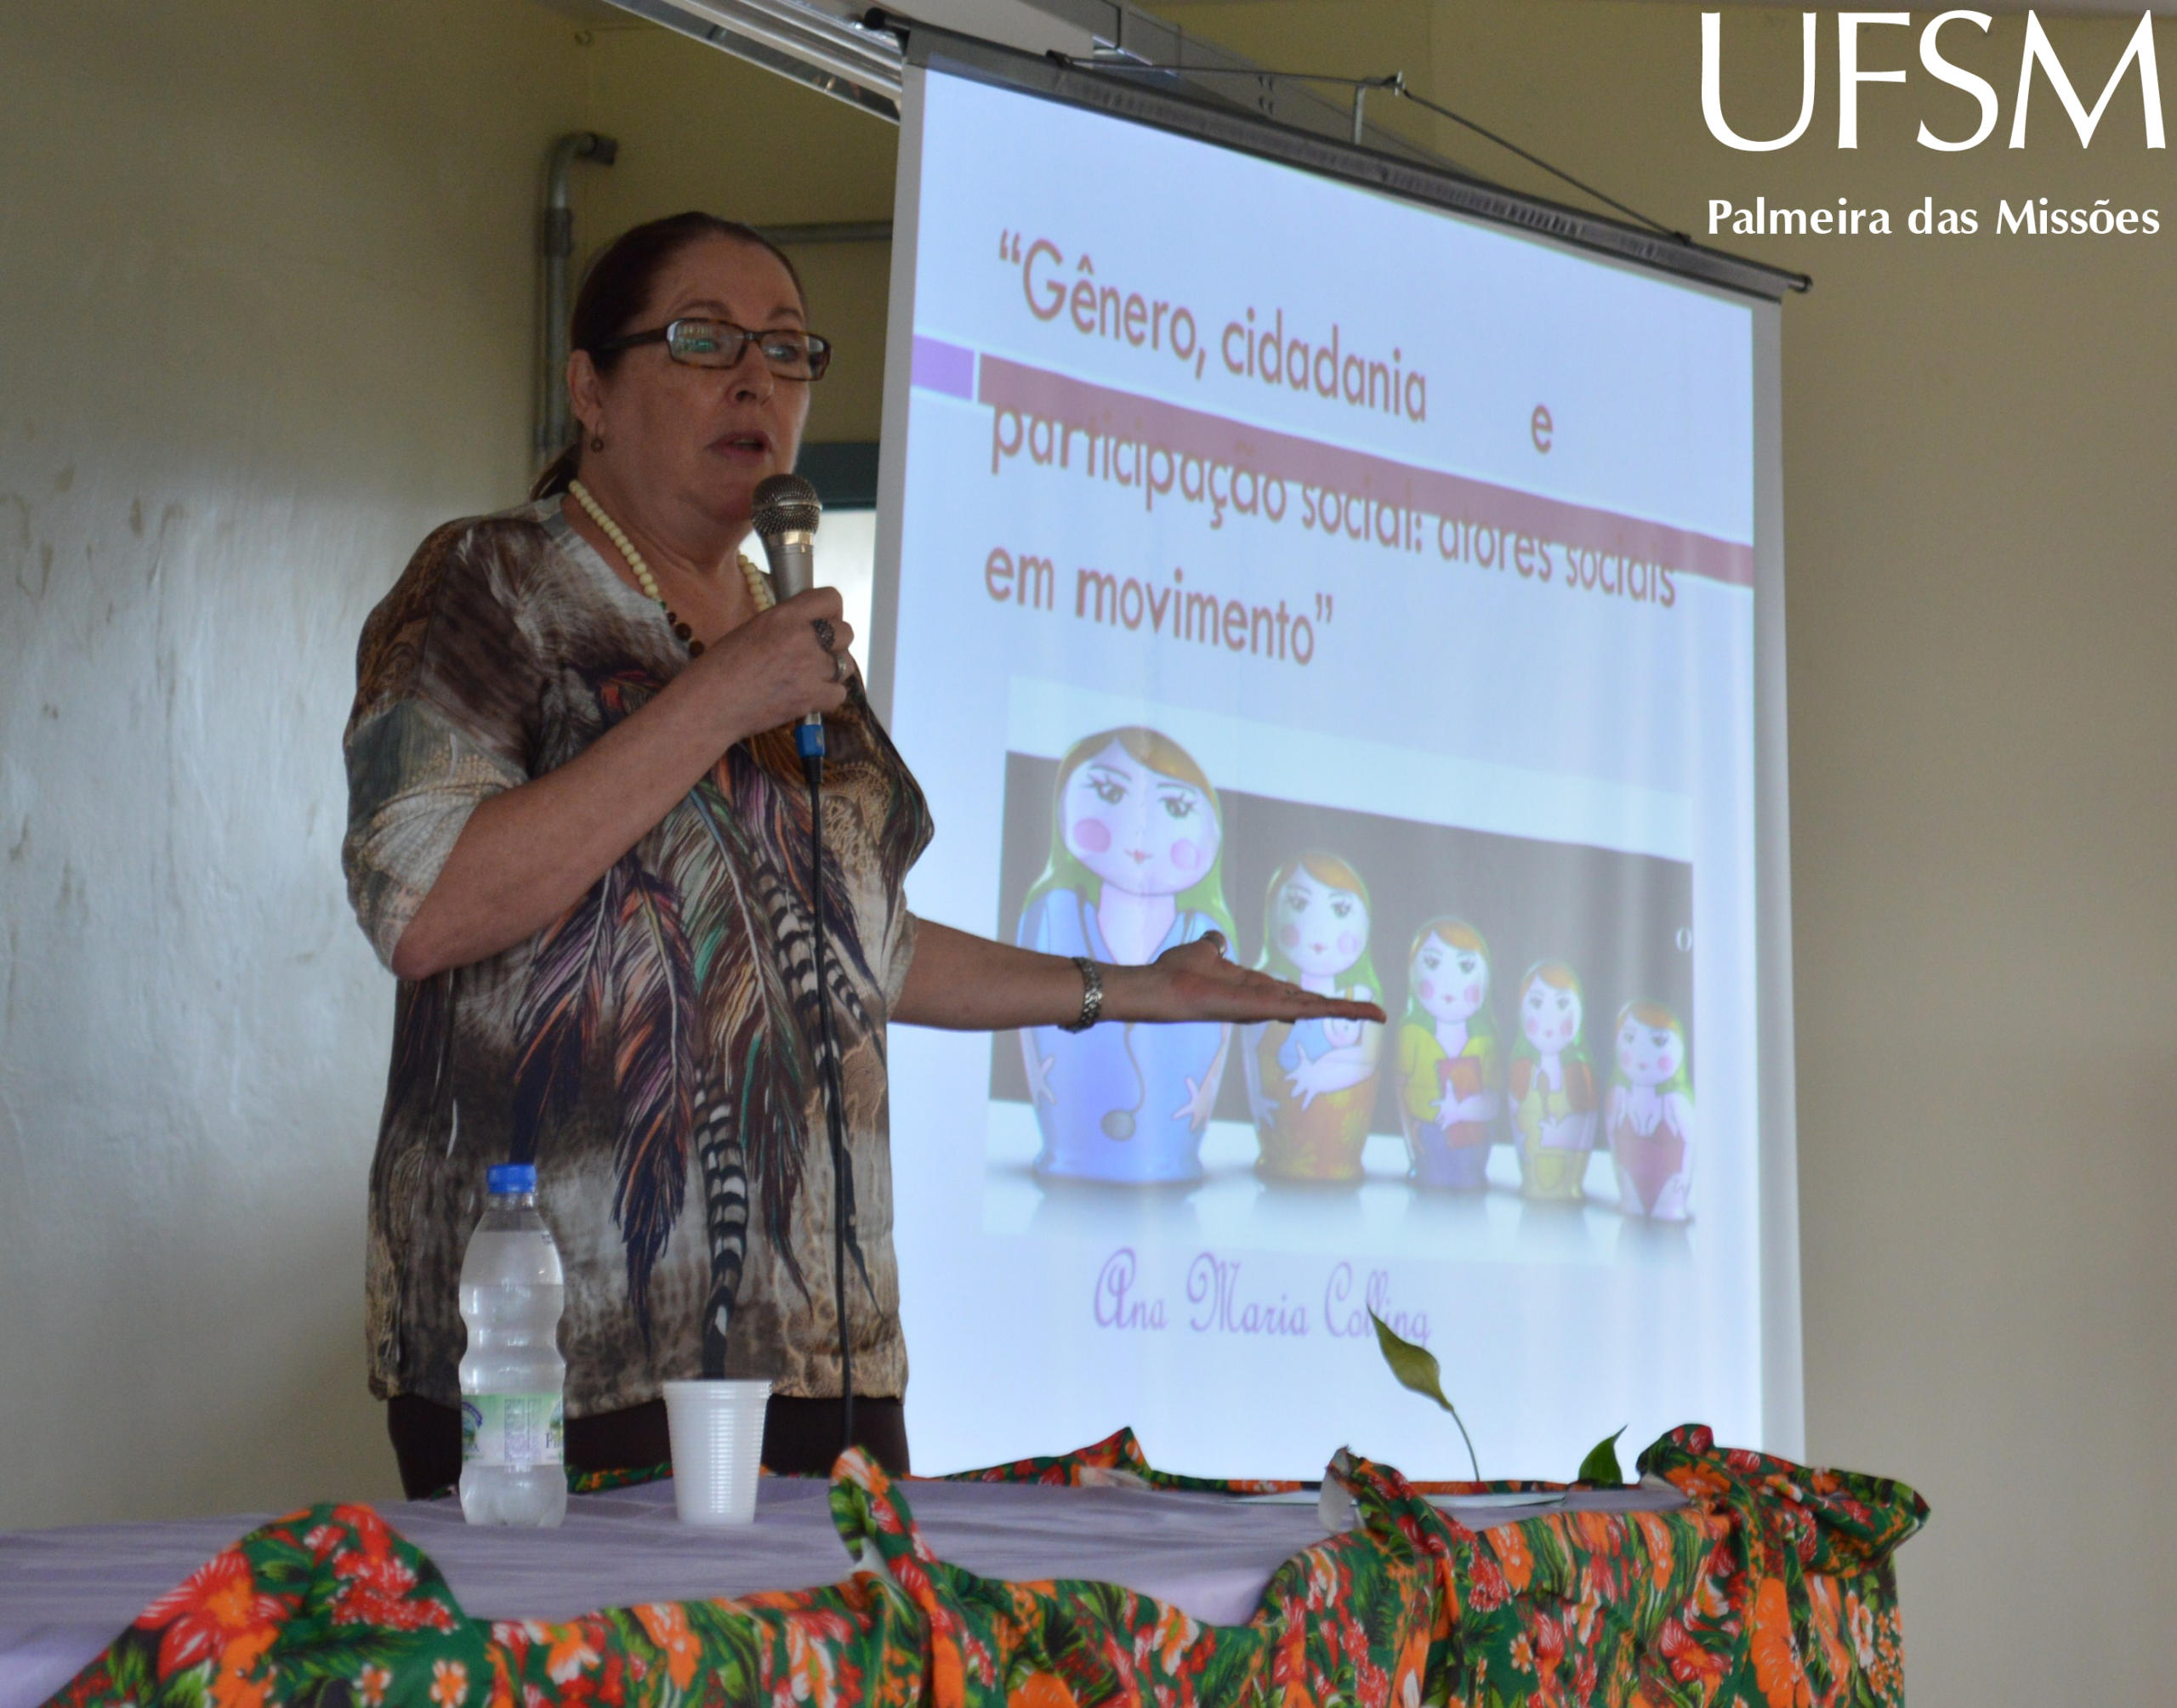 2 - Conferência prof.ª Ana Maria Colling